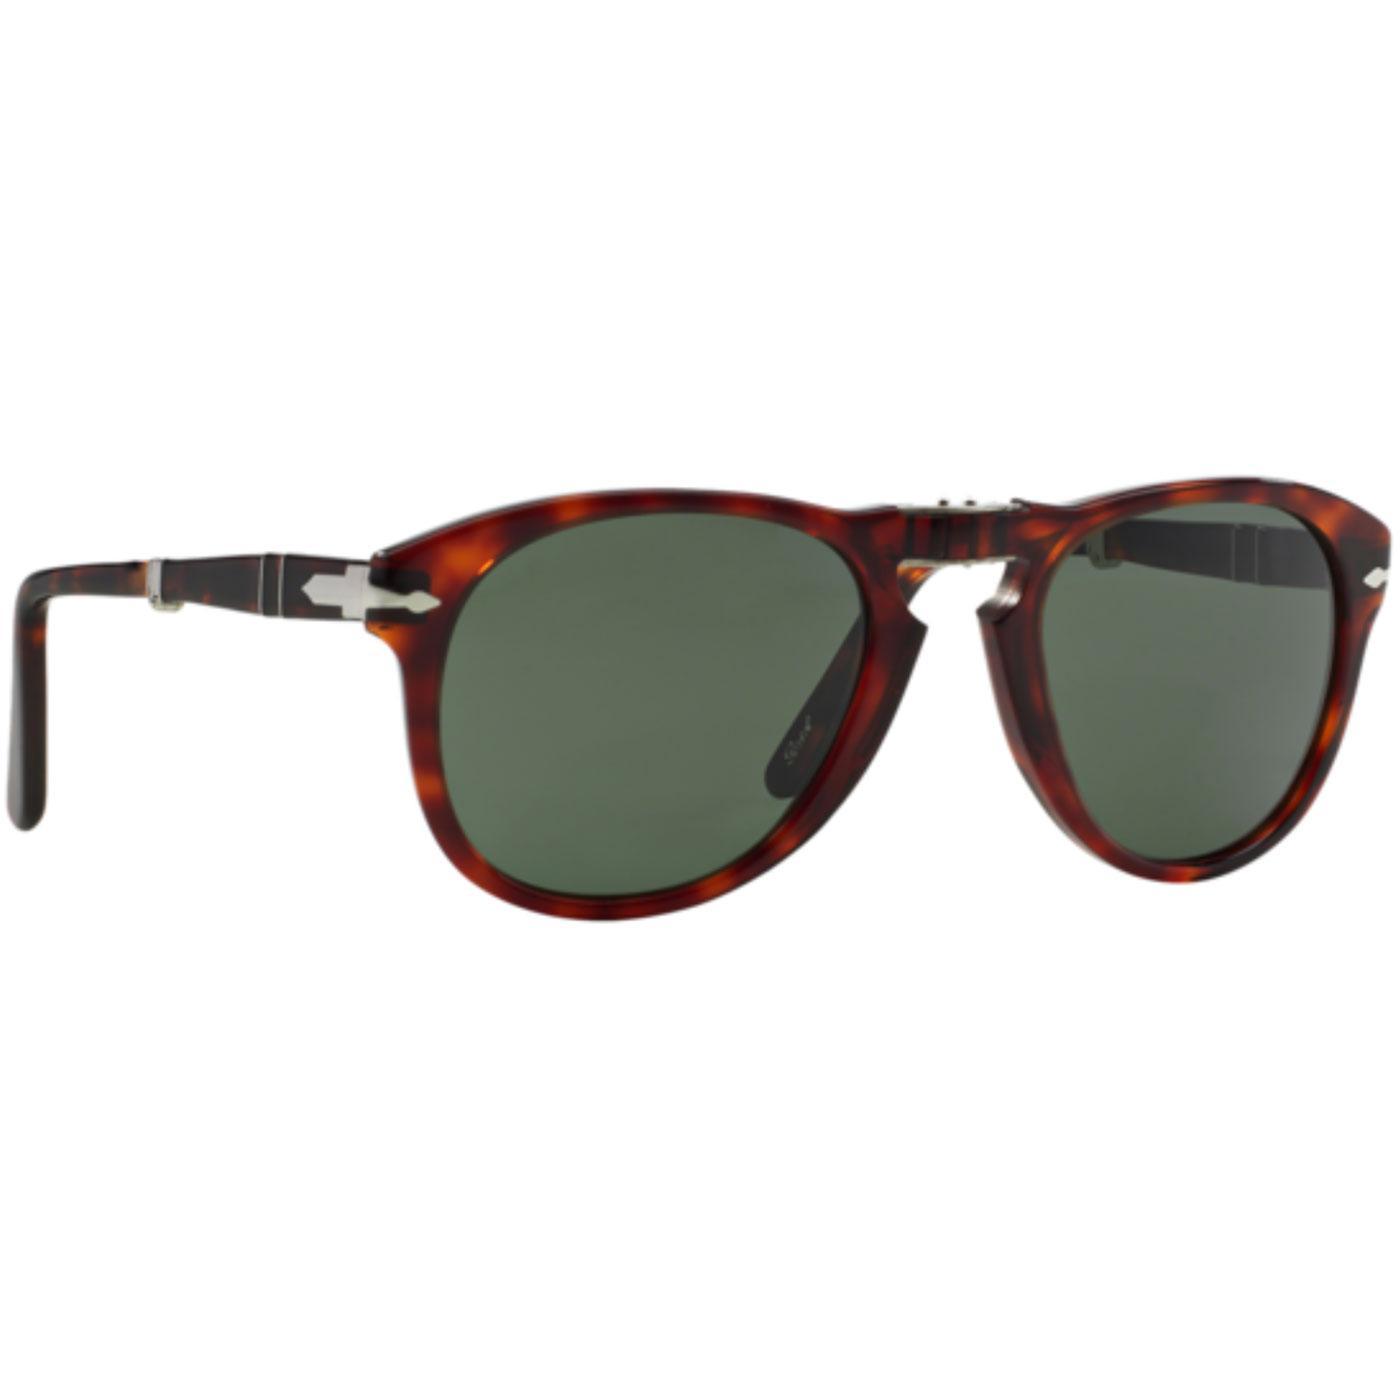 1bce73efec12 PERSOL Folding 714 Series Men's Mod Sunglasses in Havana